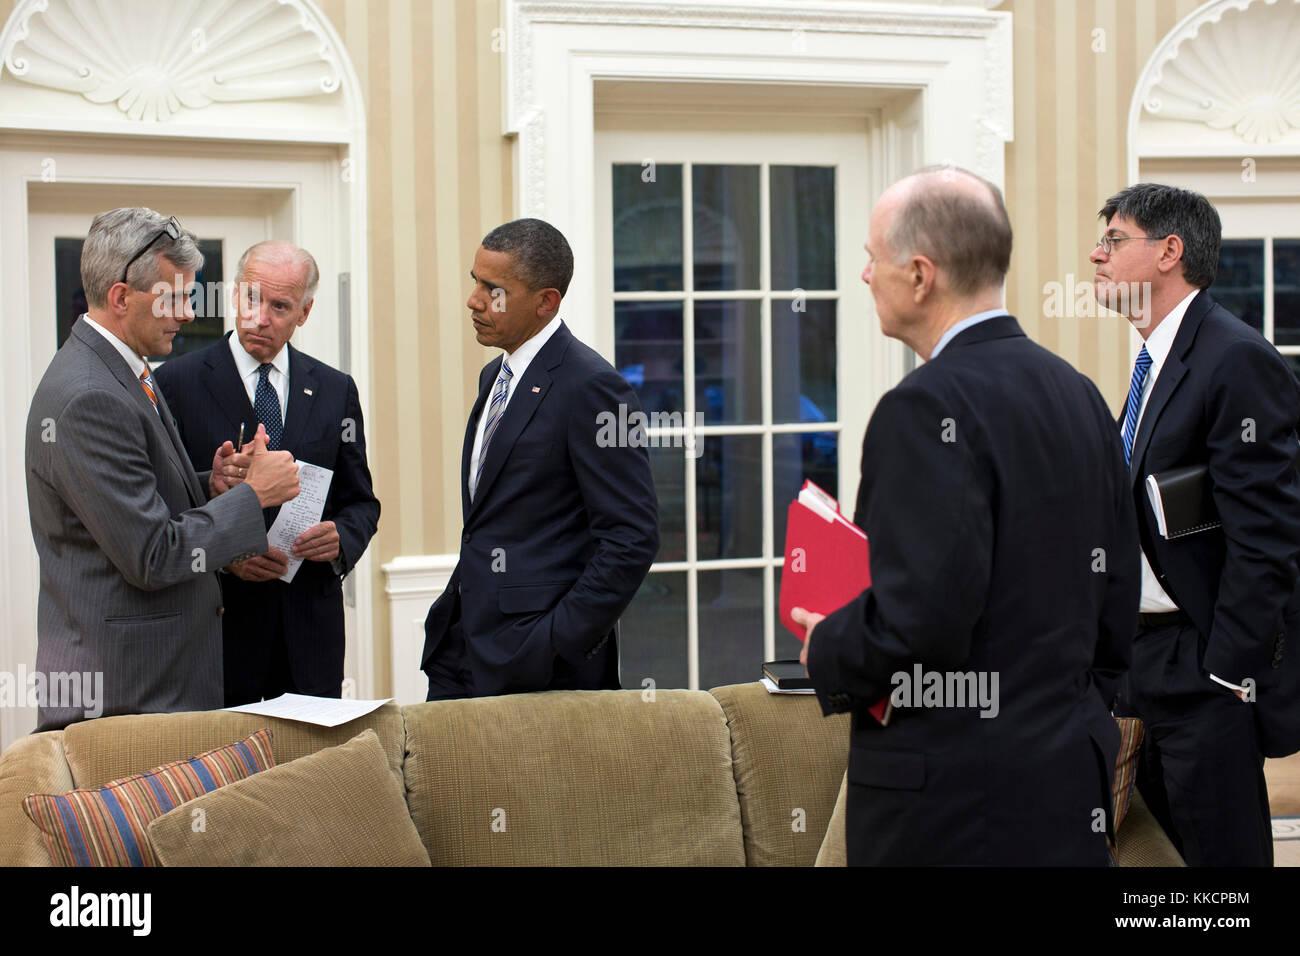 President Barack Obama and Vice President Joe Biden talk with senior advisors in the Oval Office, Sept. 11, 2012. - Stock Image